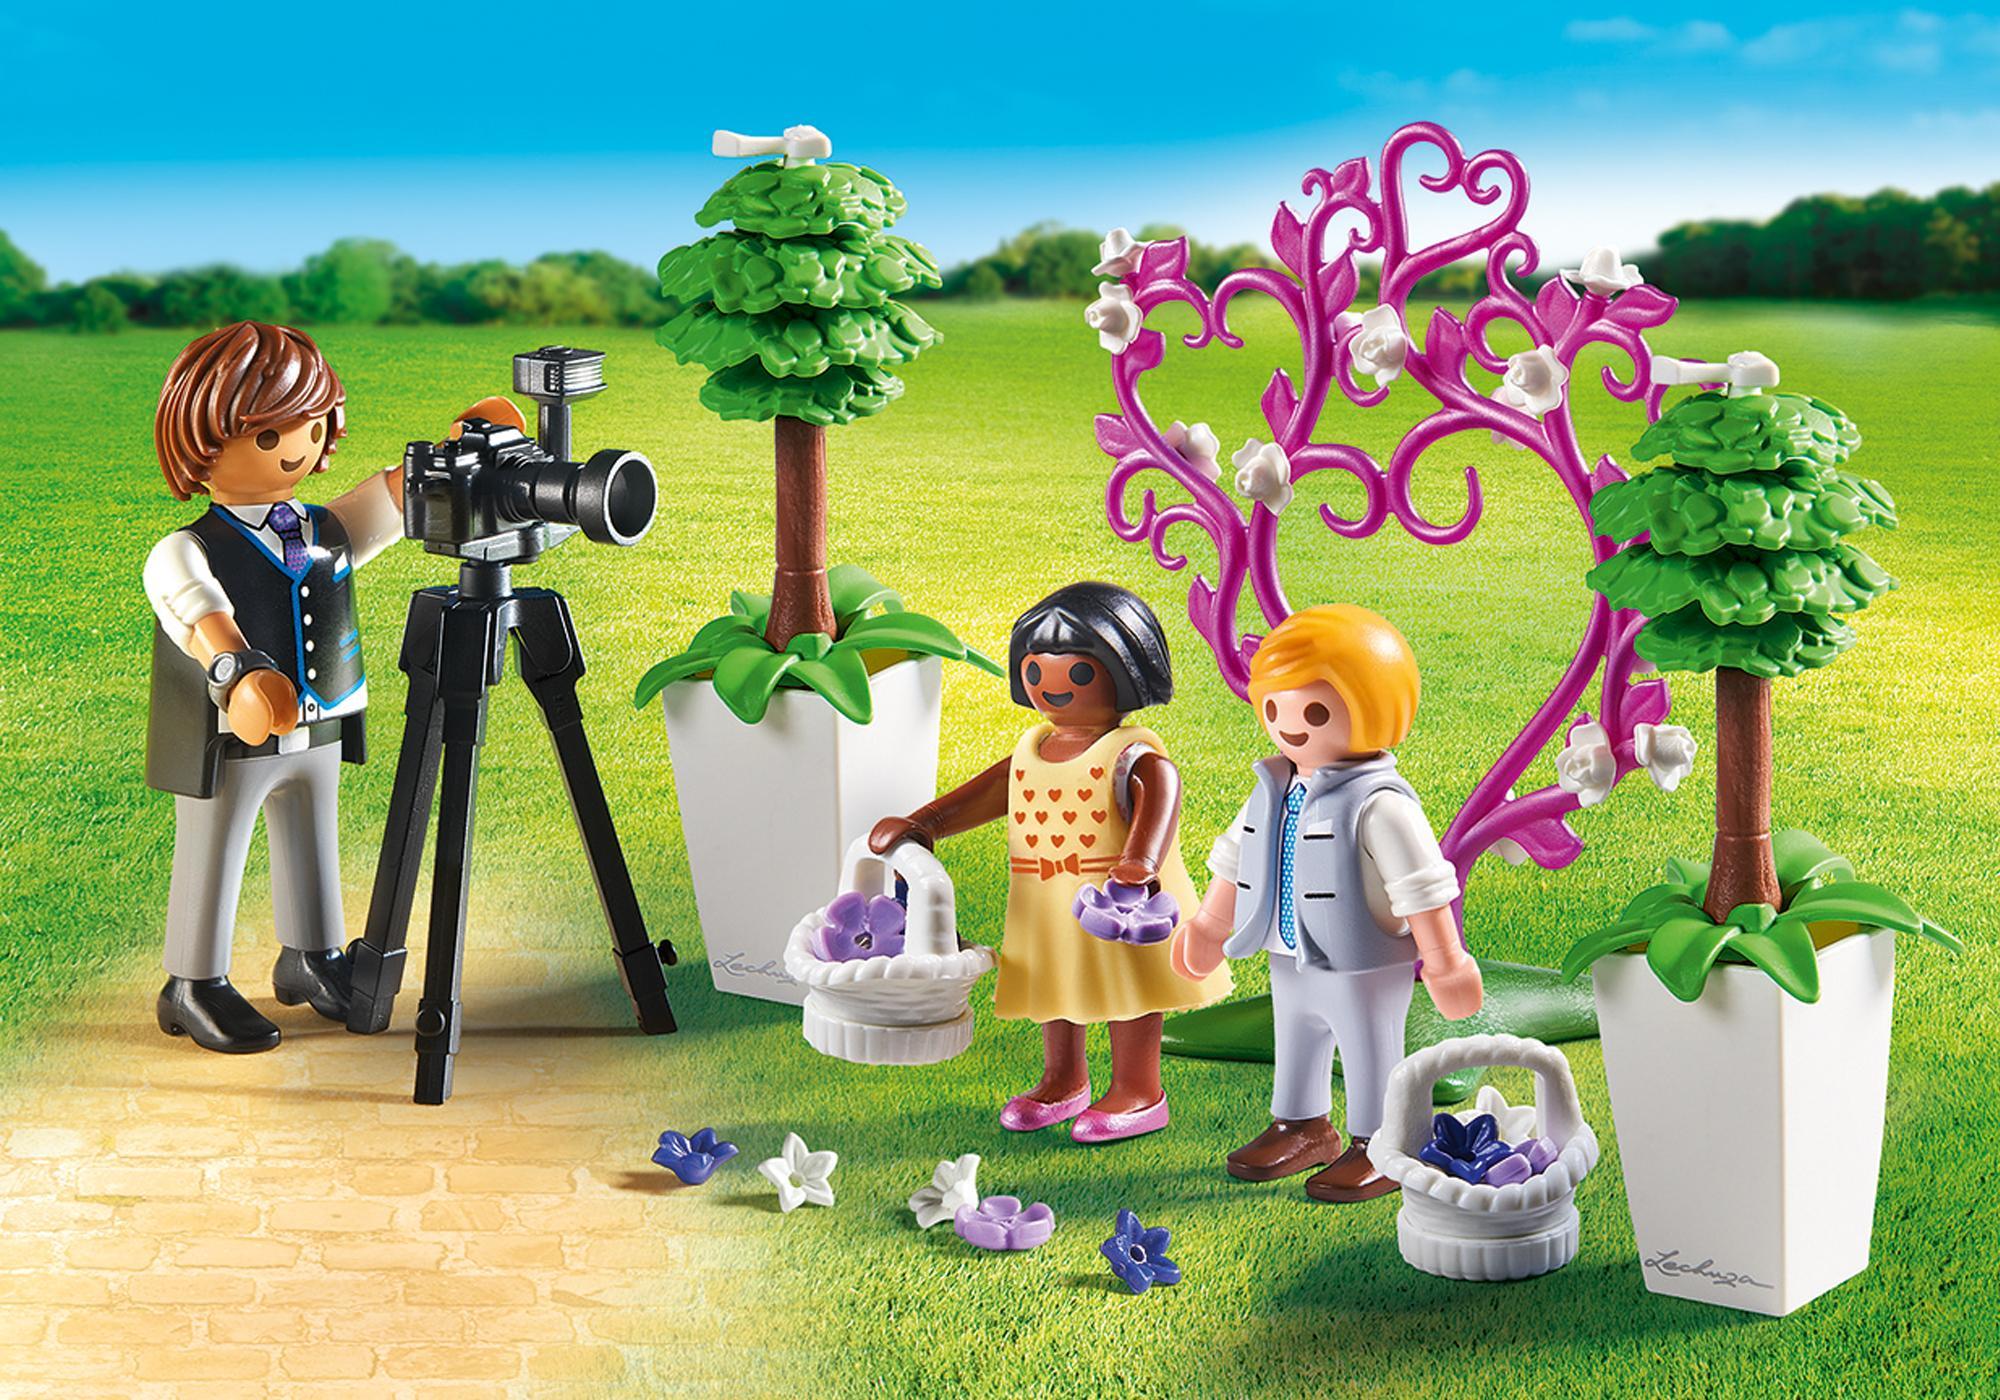 http://media.playmobil.com/i/playmobil/9230_product_detail/Flower Children and Photographer